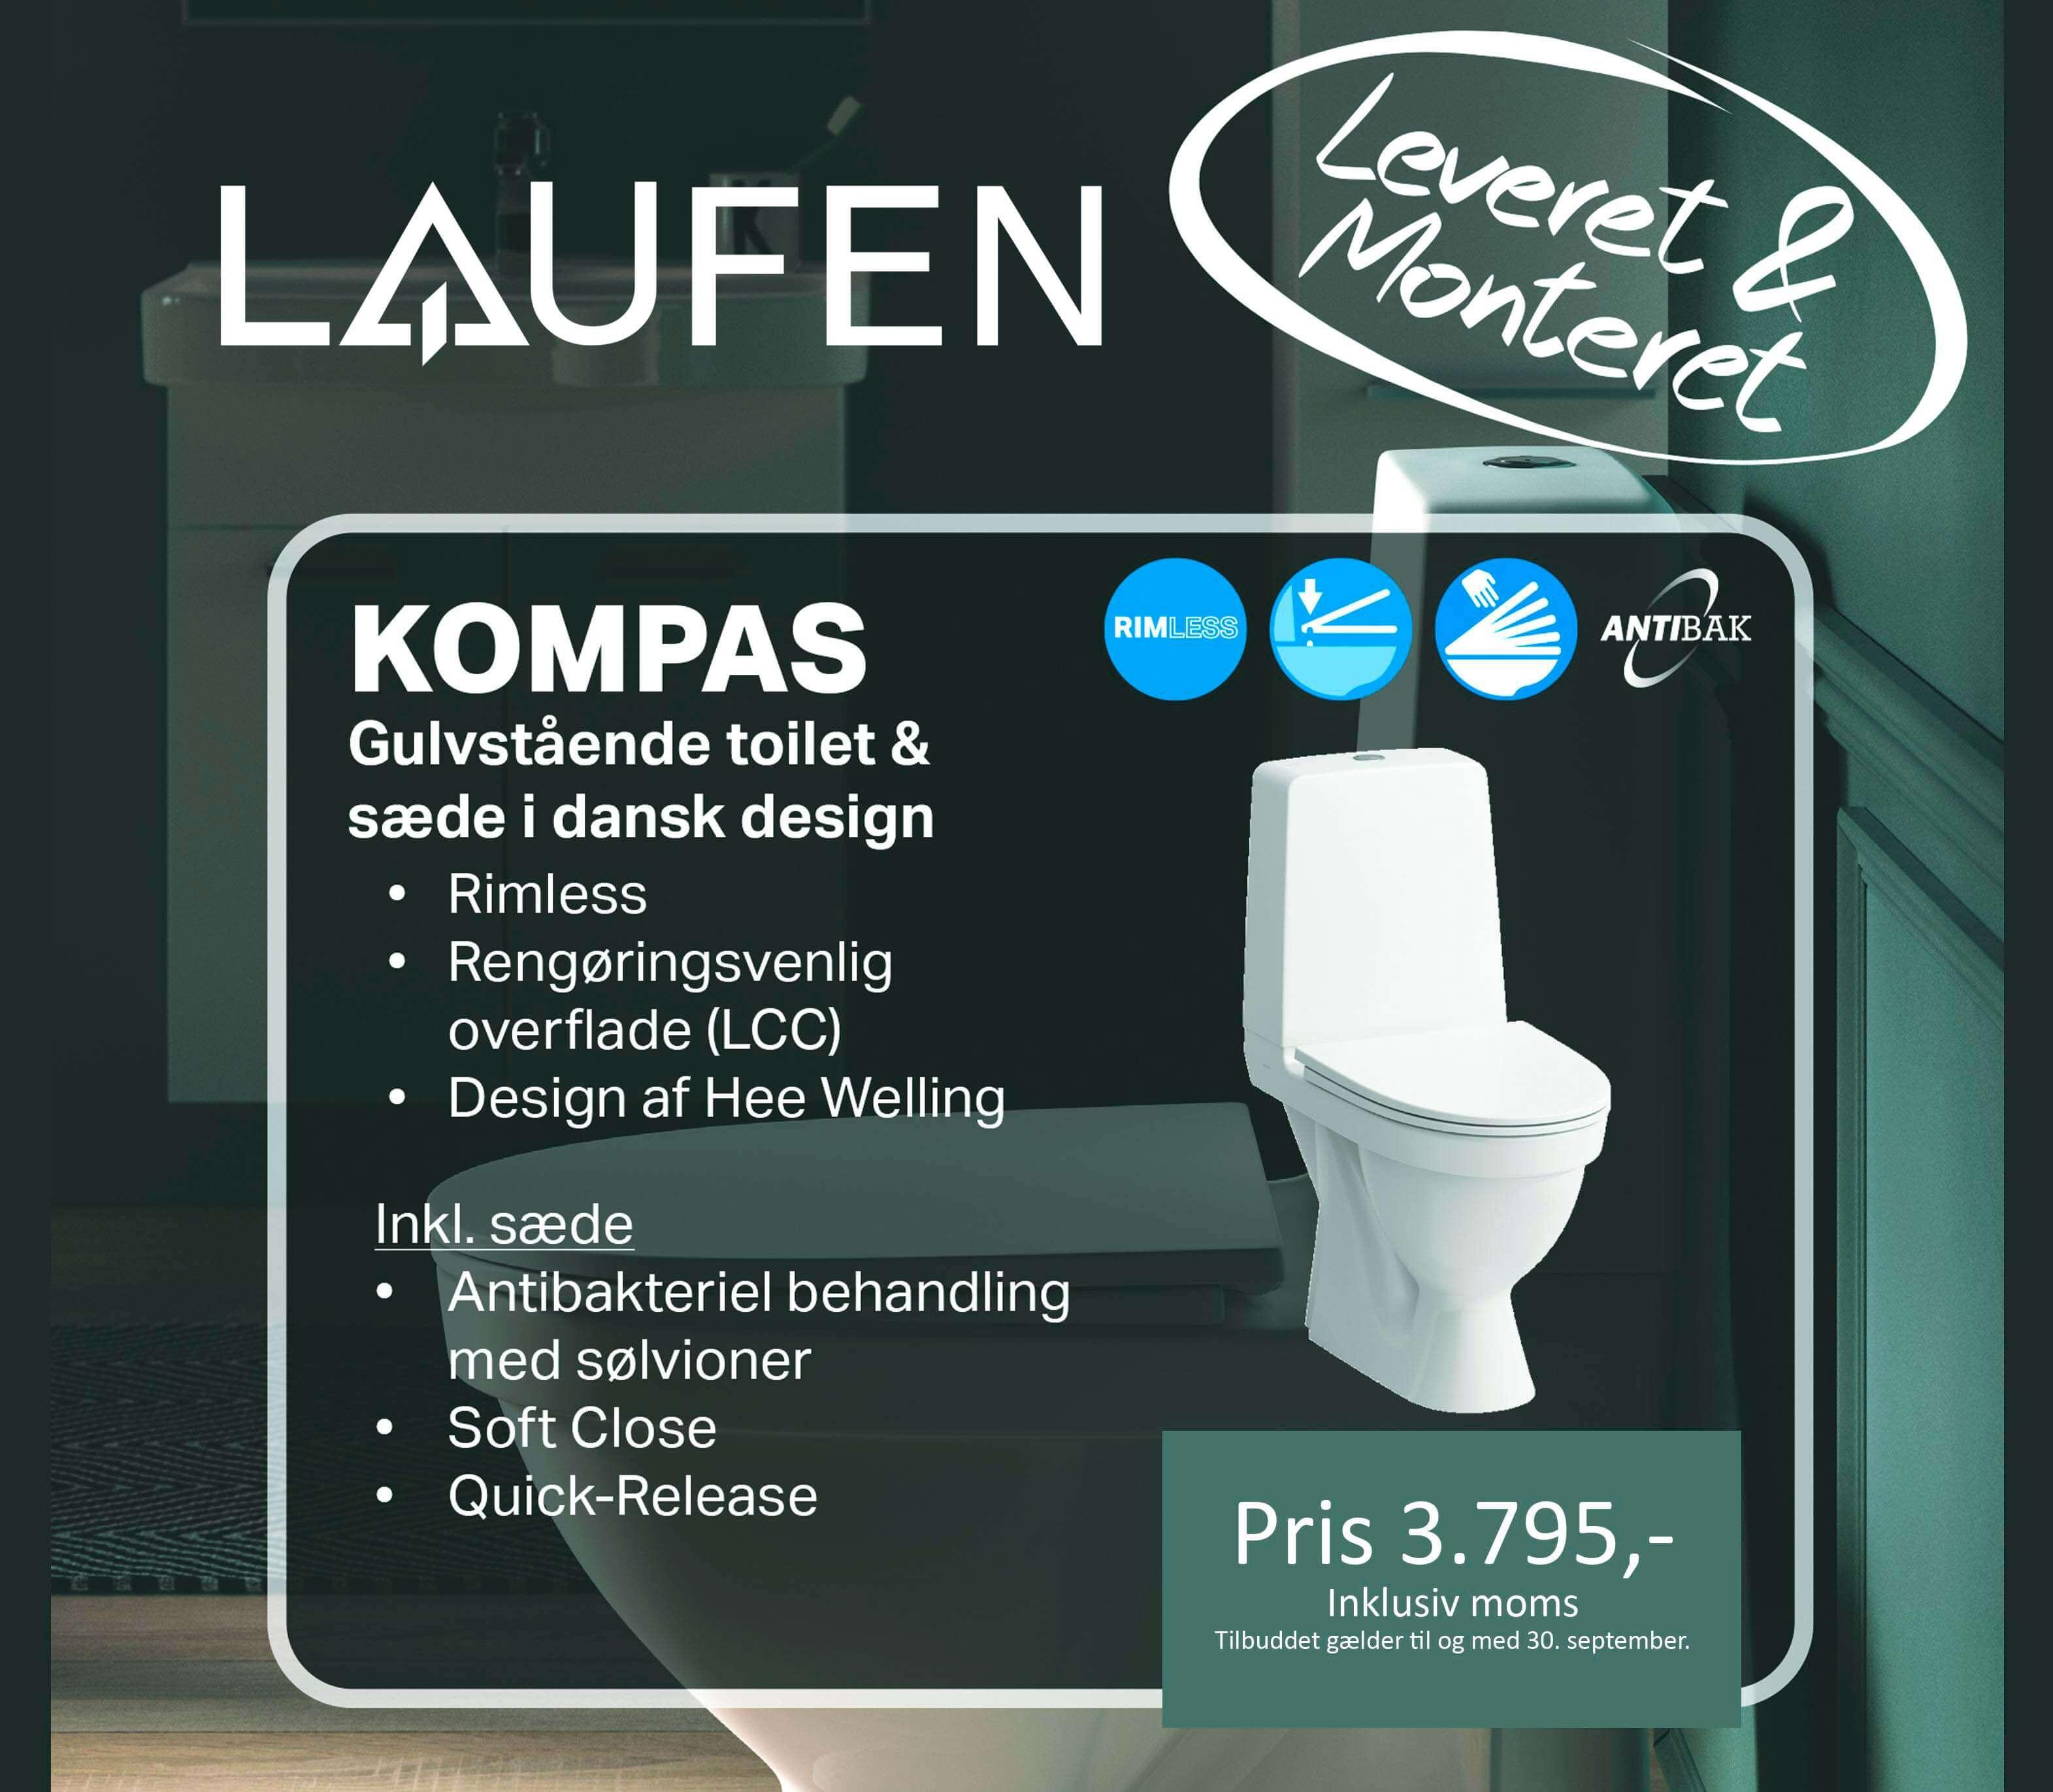 Laufen-Kompas-kampagne-2021